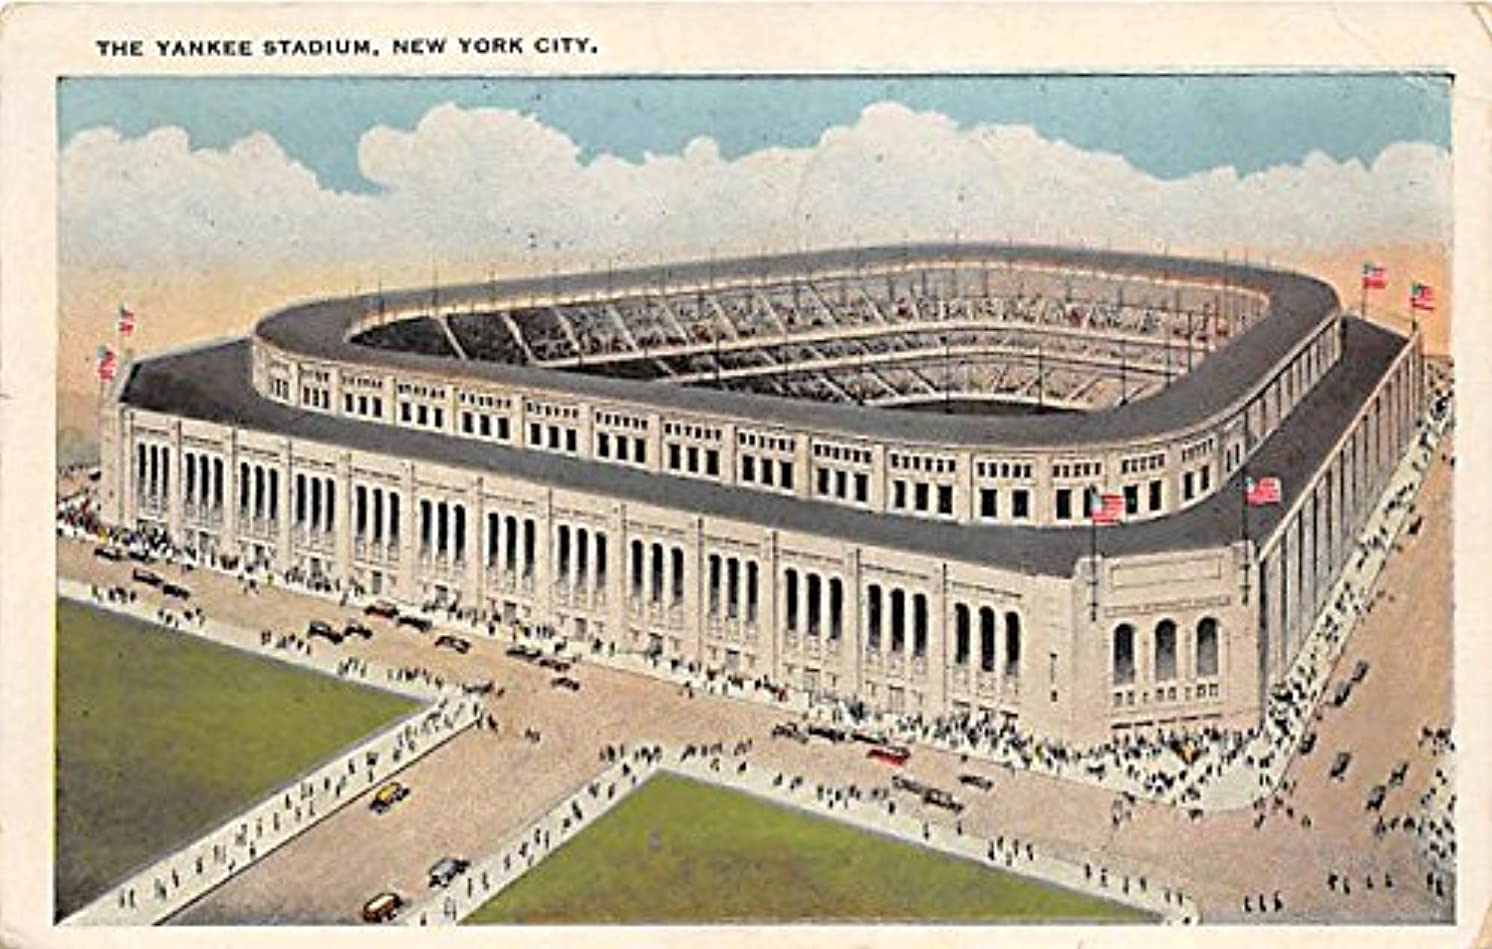 The Yankee Stadium New York City, NY, USA Old Vintage Postcard Post Card